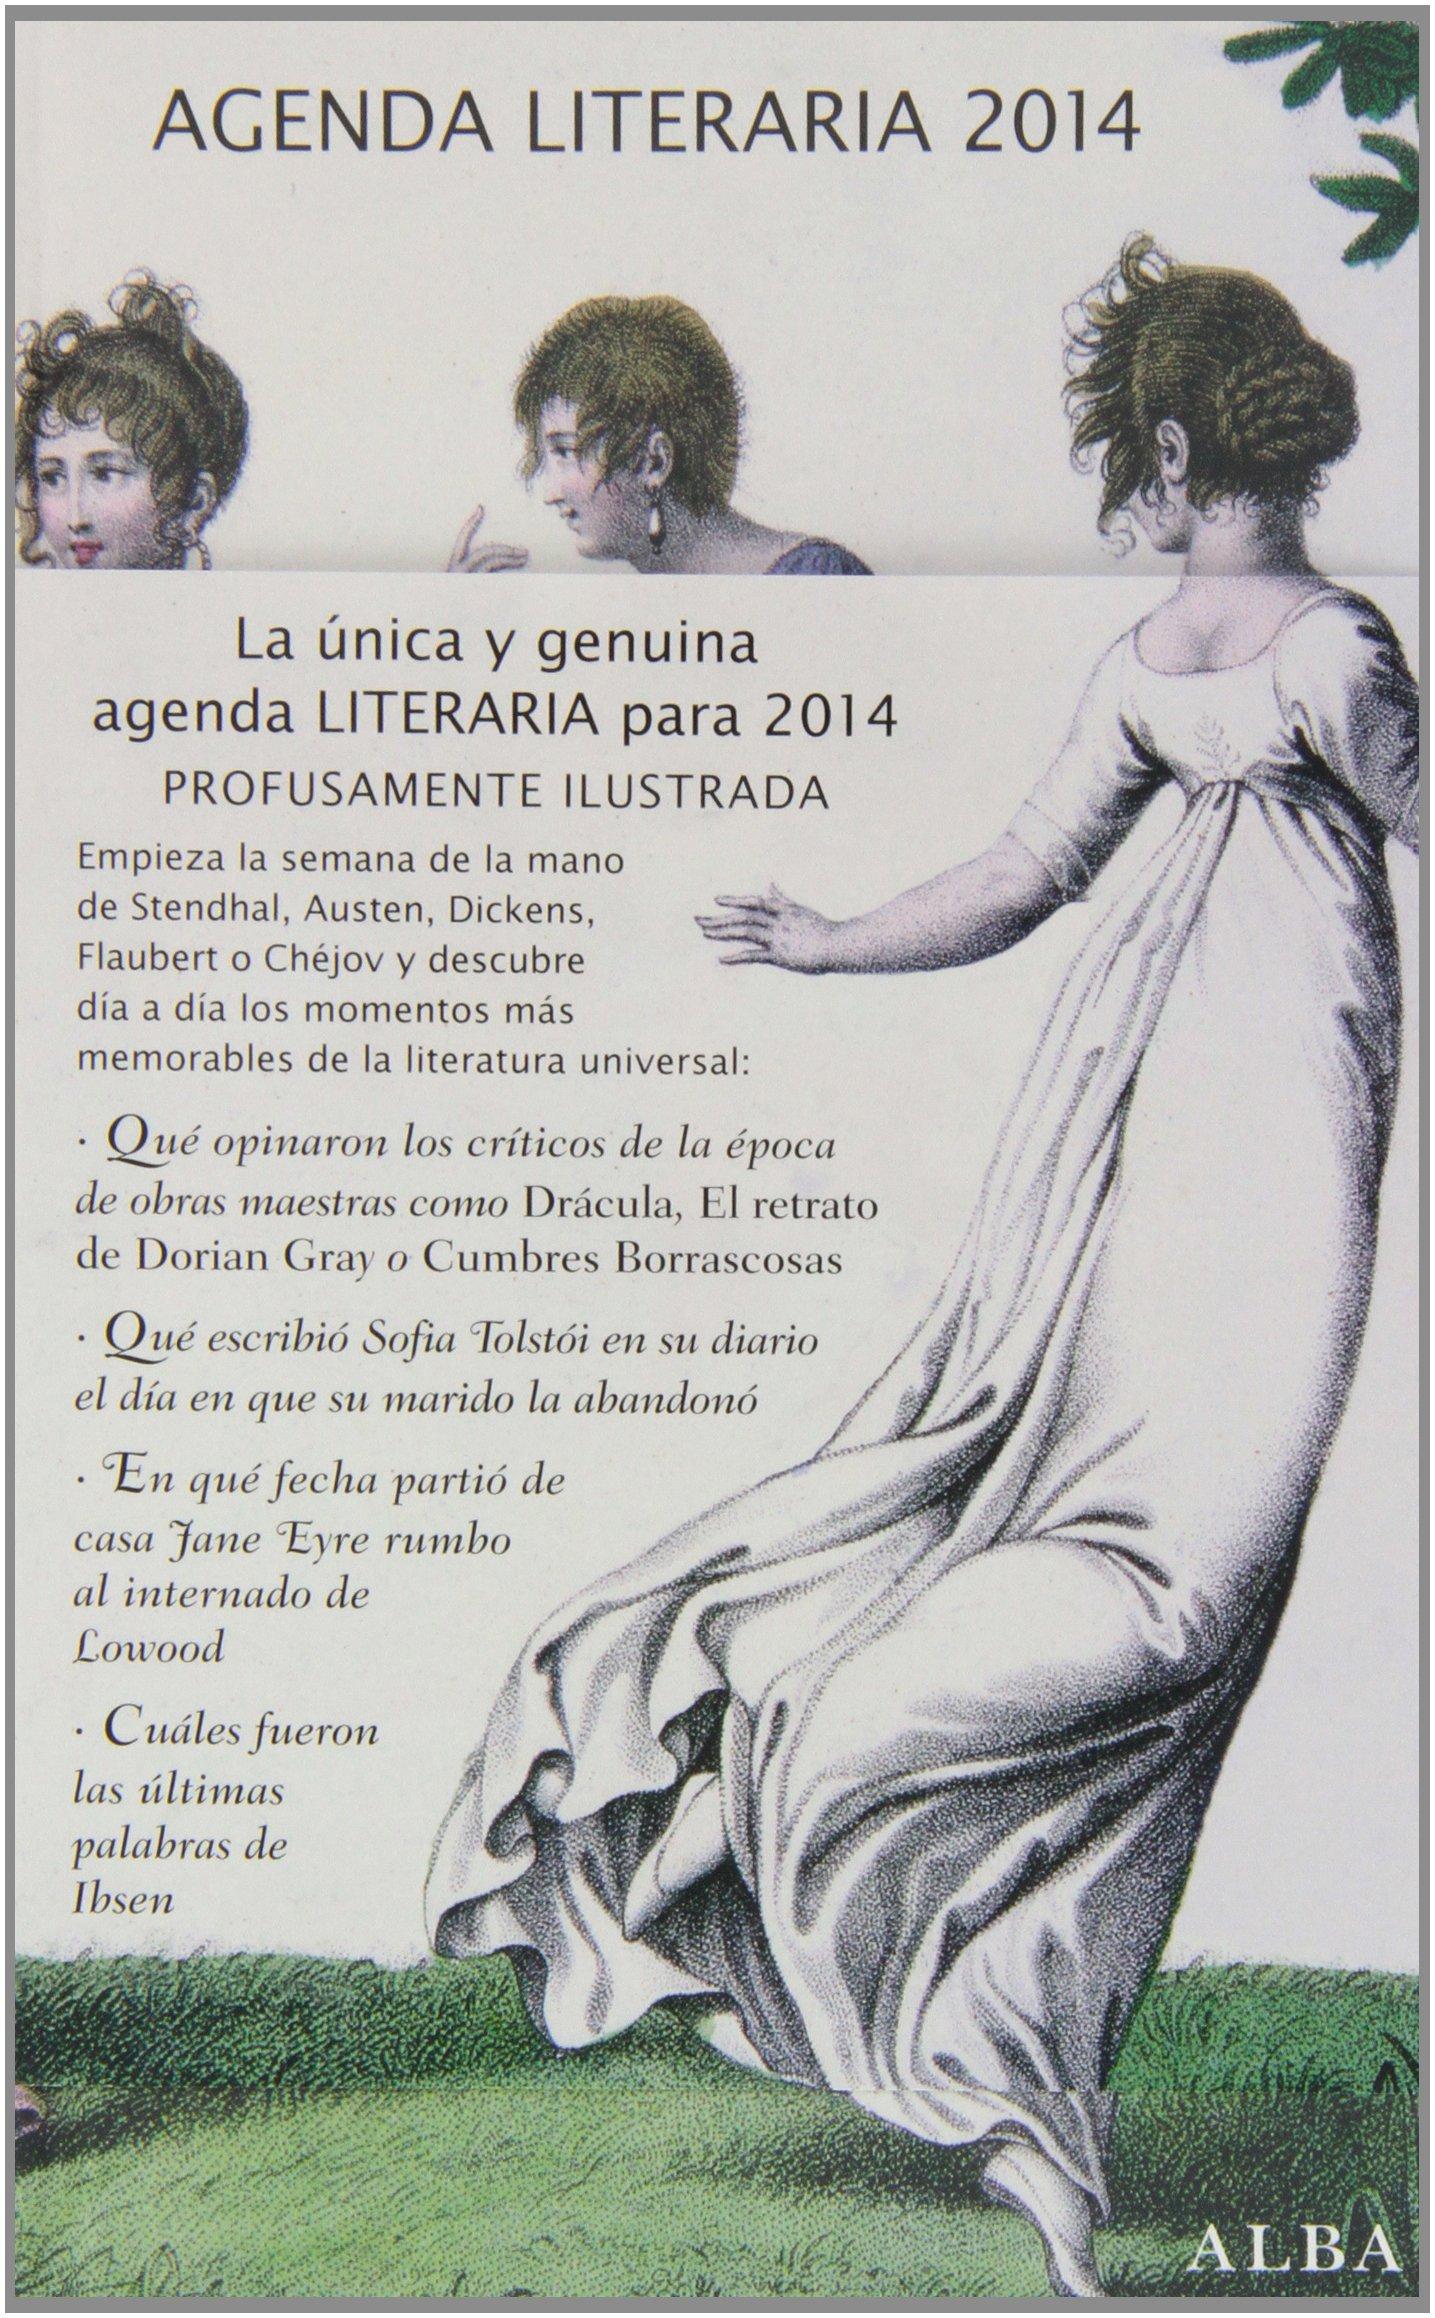 Agenda literaria 2014: ALBA EDITORIAL: 9788484289135: Amazon ...